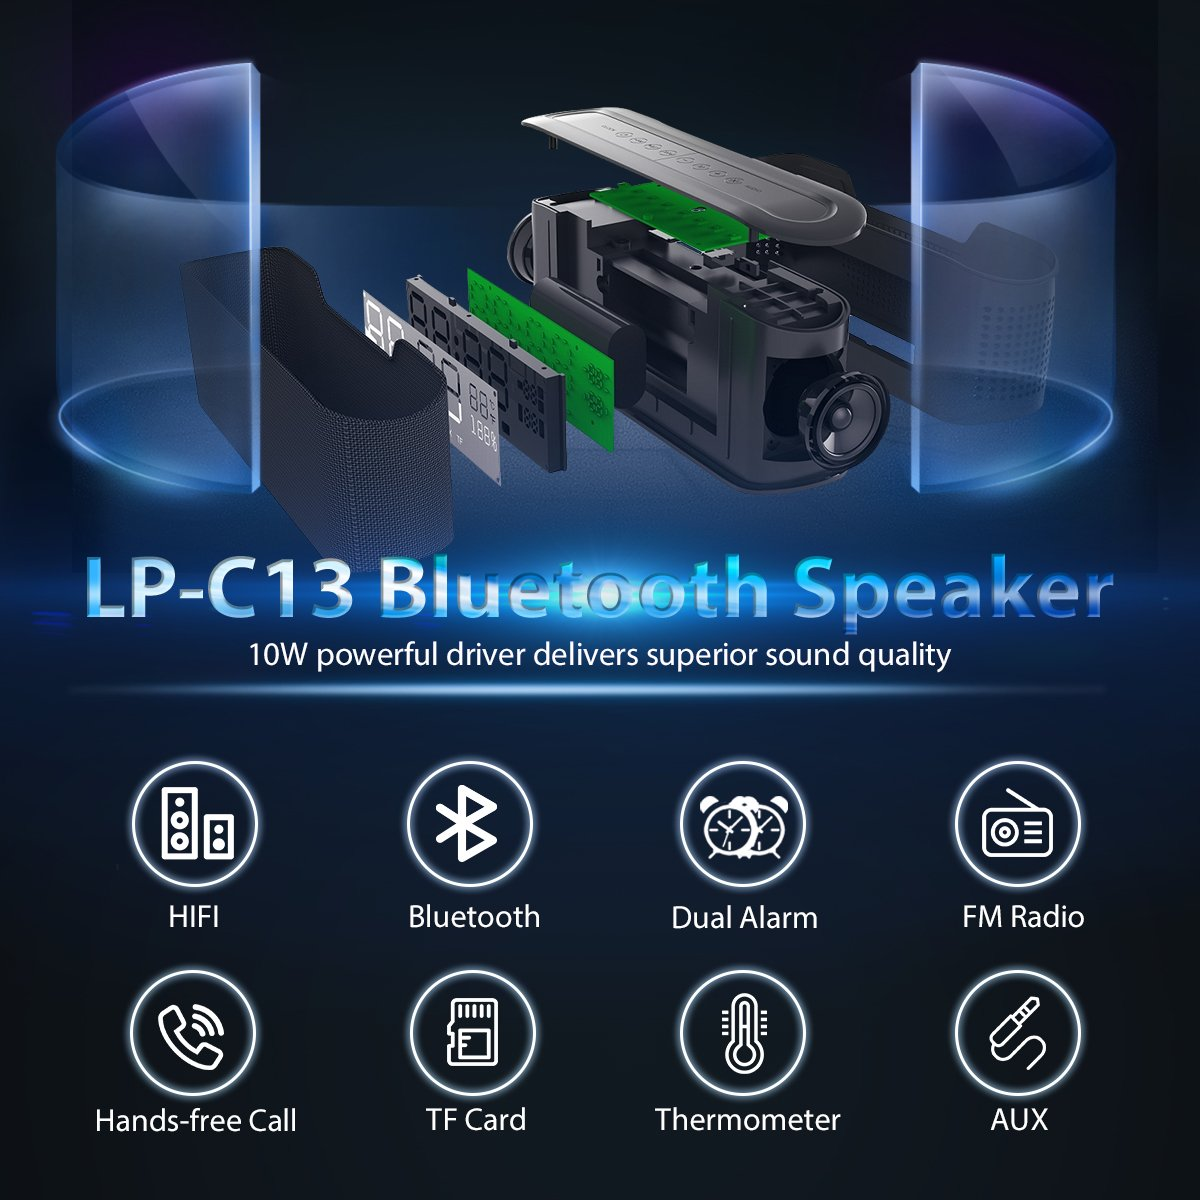 Portable Bluetooth Speaker Elegiant Nakamichi My Mini Plus With Fm Radio Pink Alarm Clock Hd Stereo Sound Enhanced Bass Micro Sd Card Slot